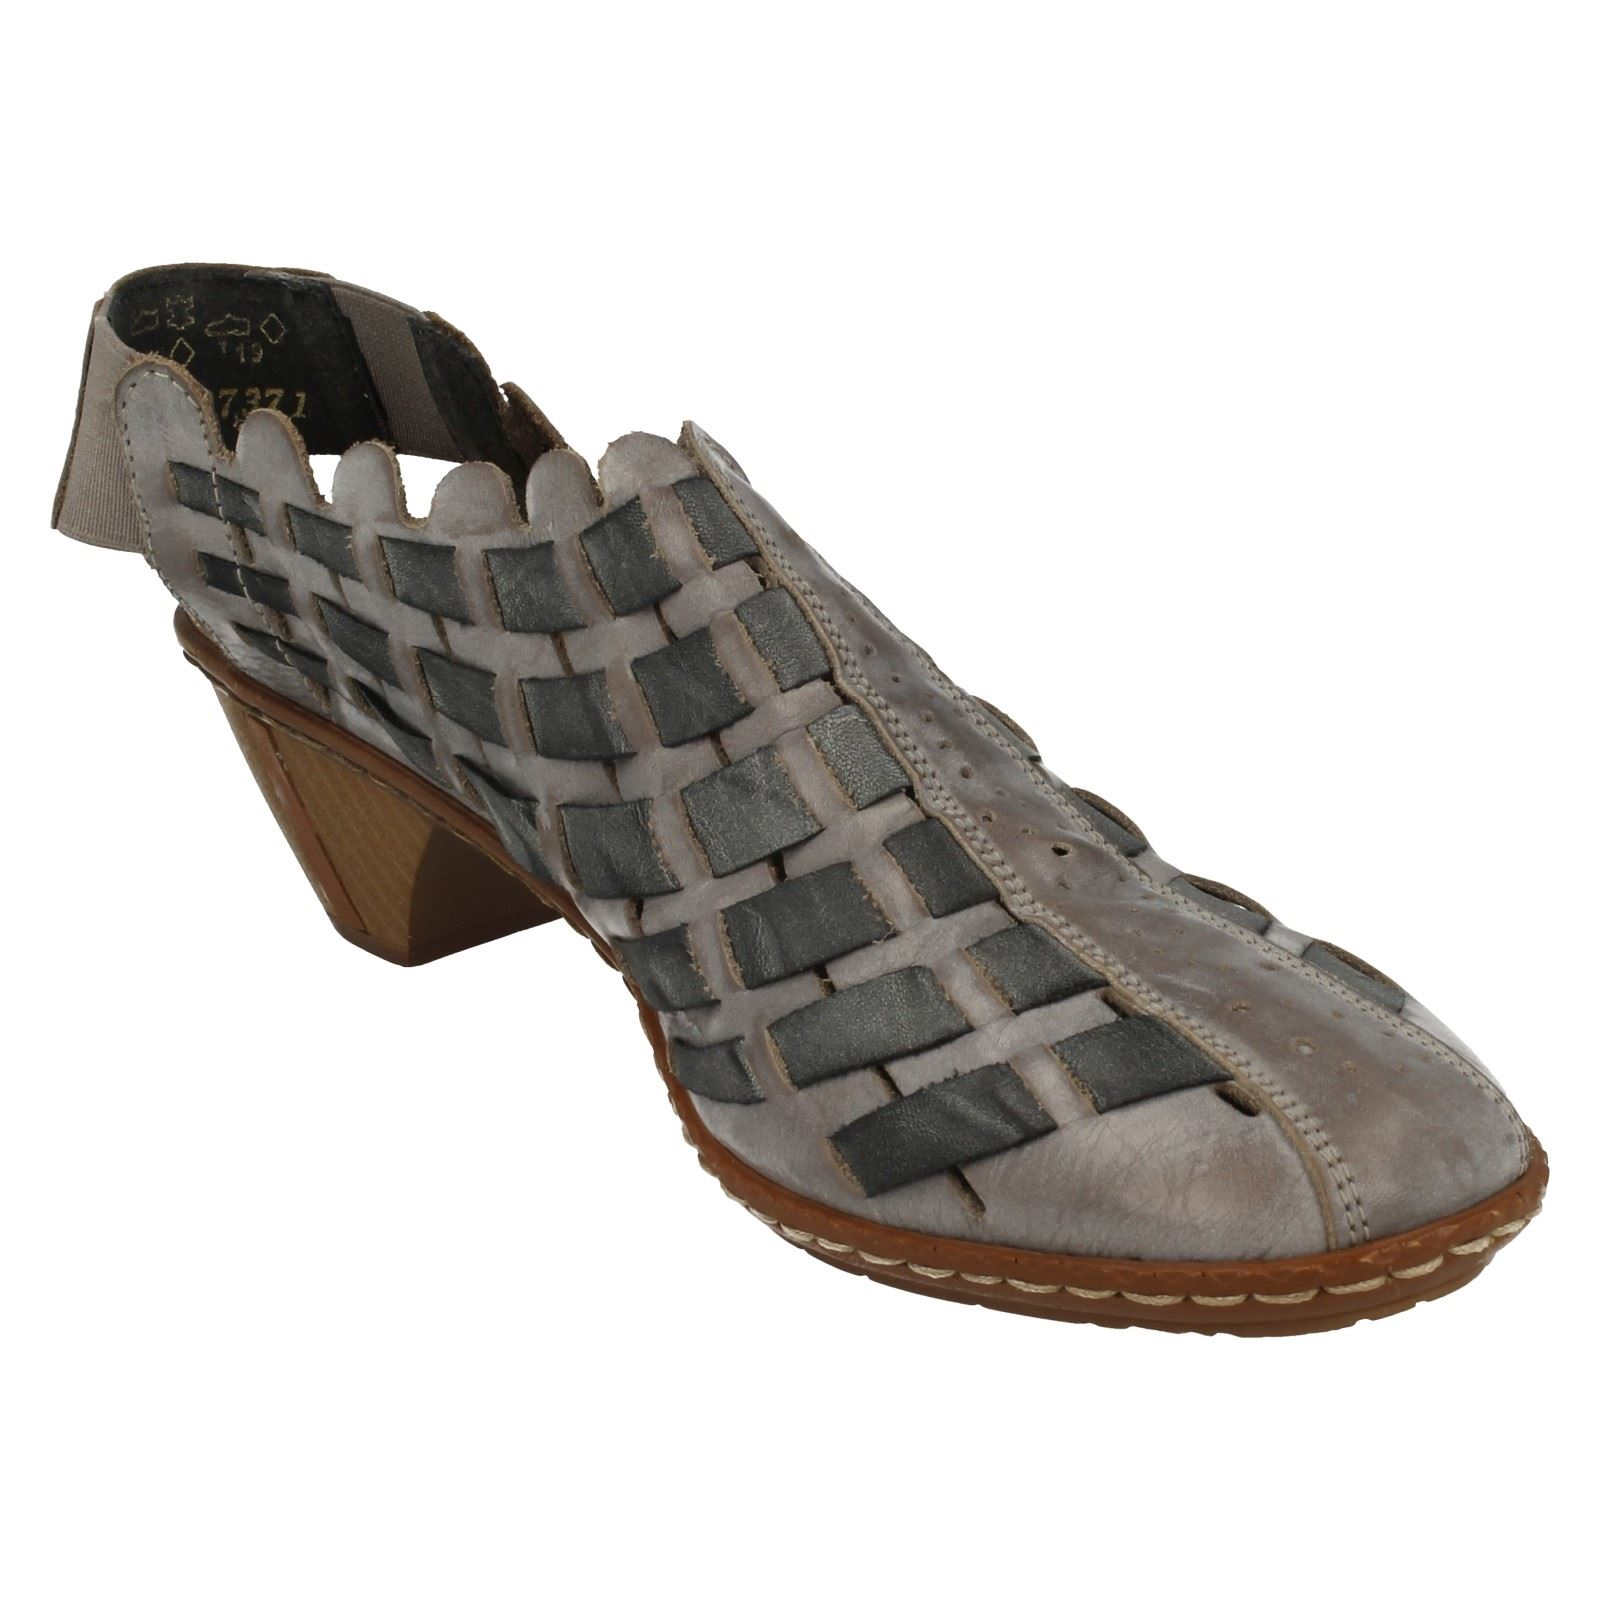 Damenschuhe Rieker Sling Back Schuhes With Woven Detail - 46778